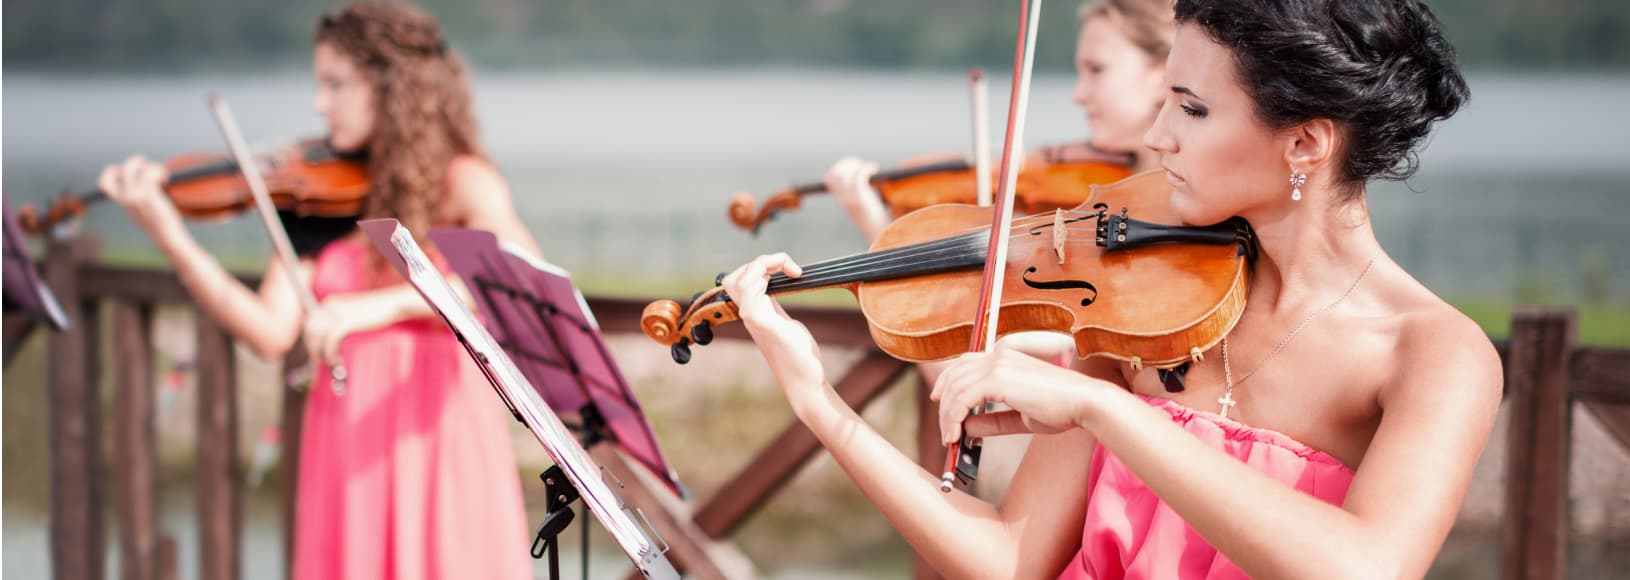 Elige la música para el matrimonio